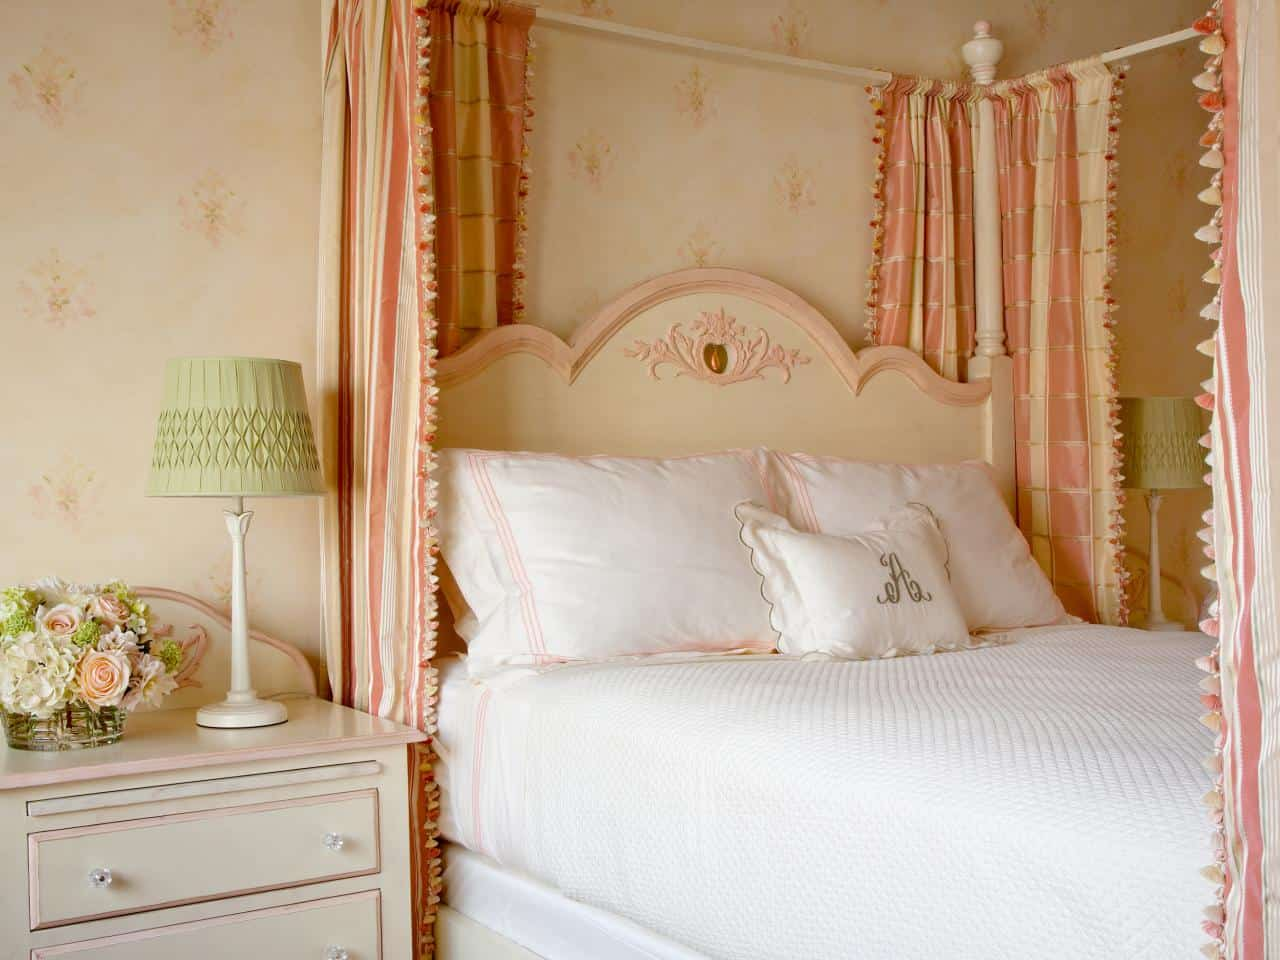 peach and cream bedroom